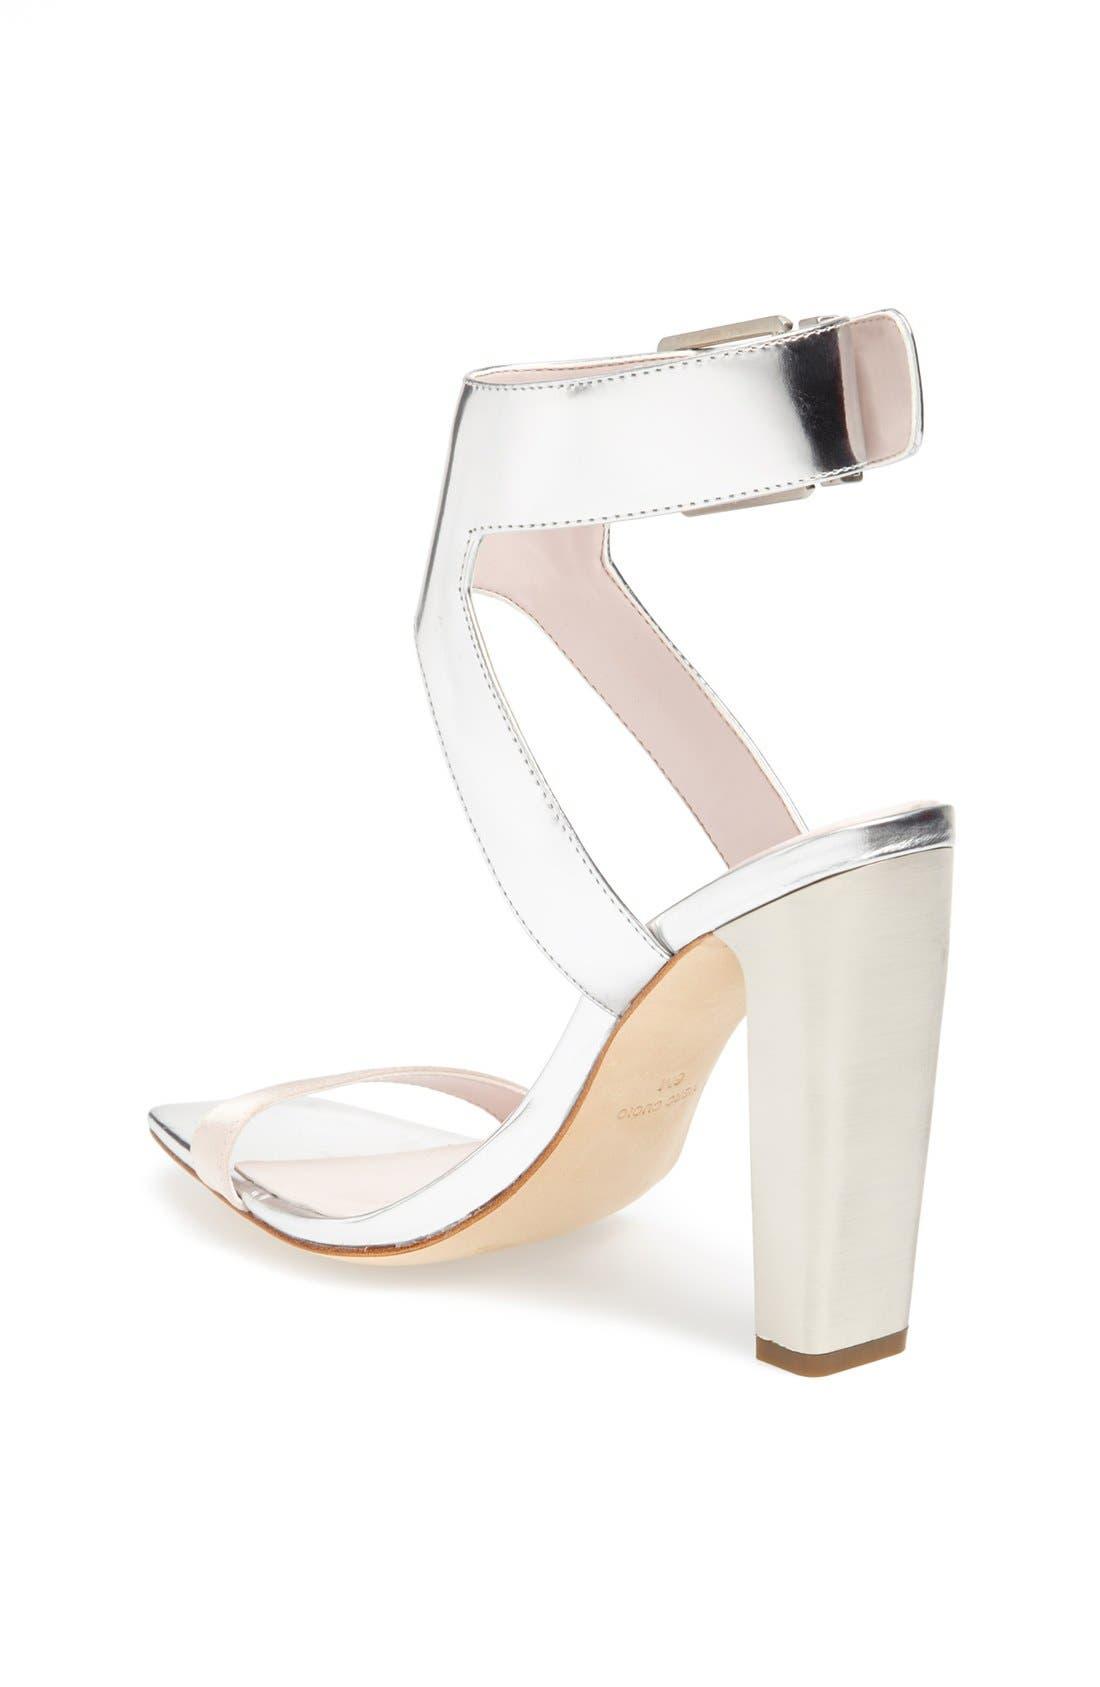 Alternate Image 3  - BCBGMAXAZRIA 'Paycer' Sandal